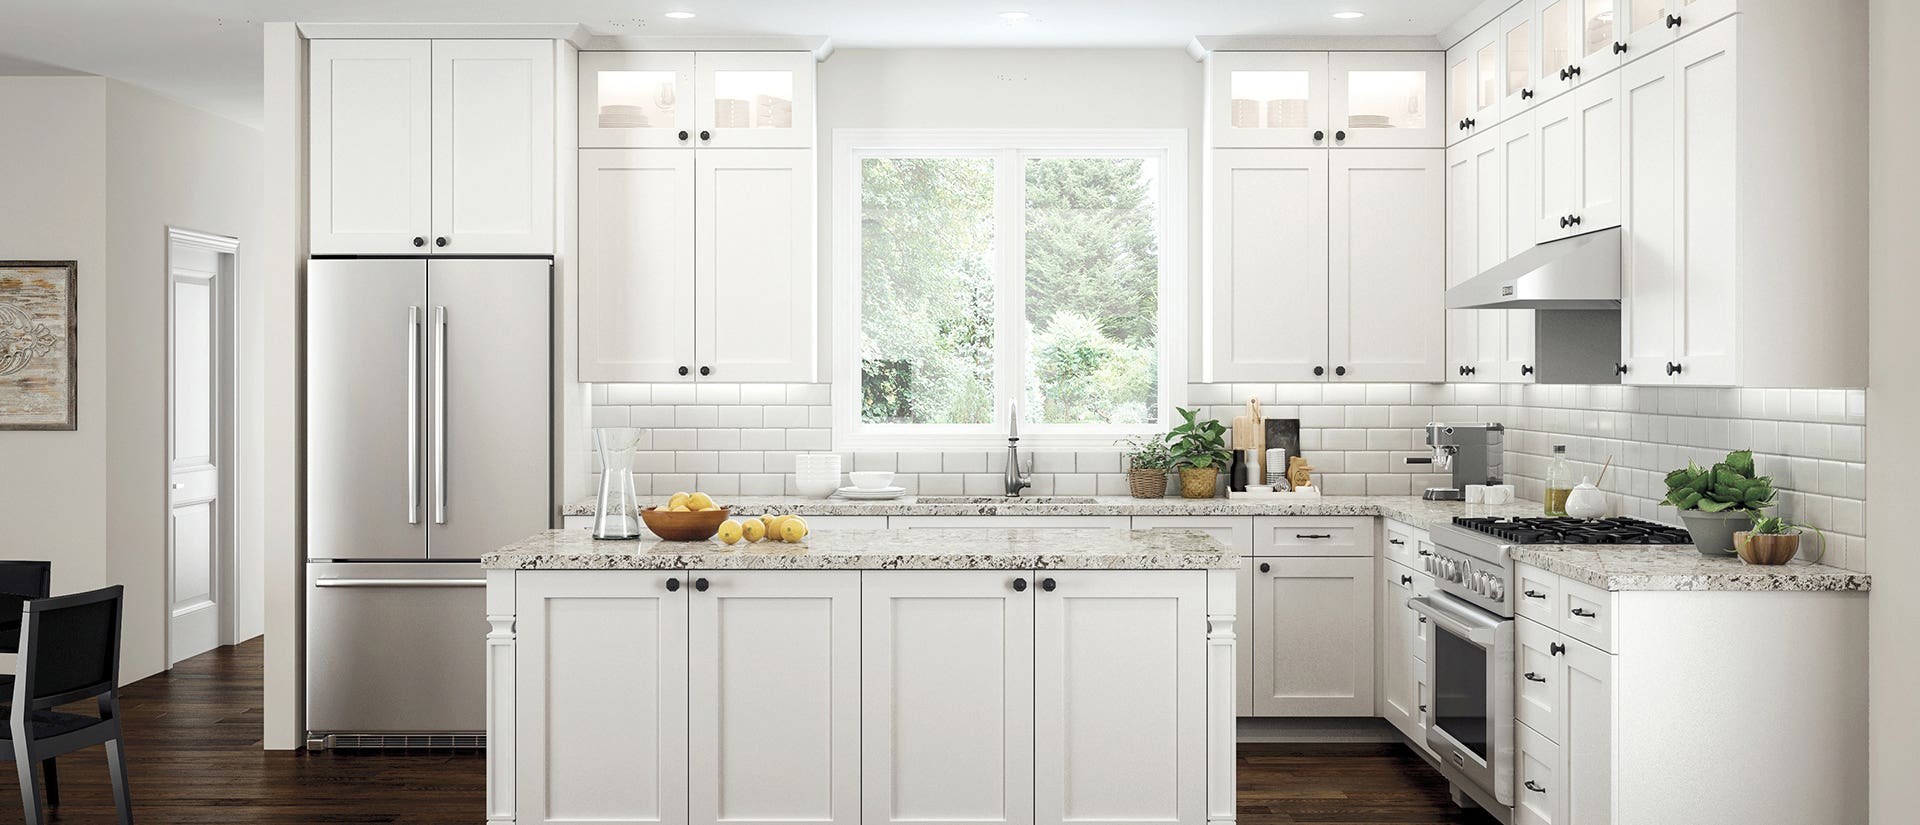 Craftsman Line Cabinets